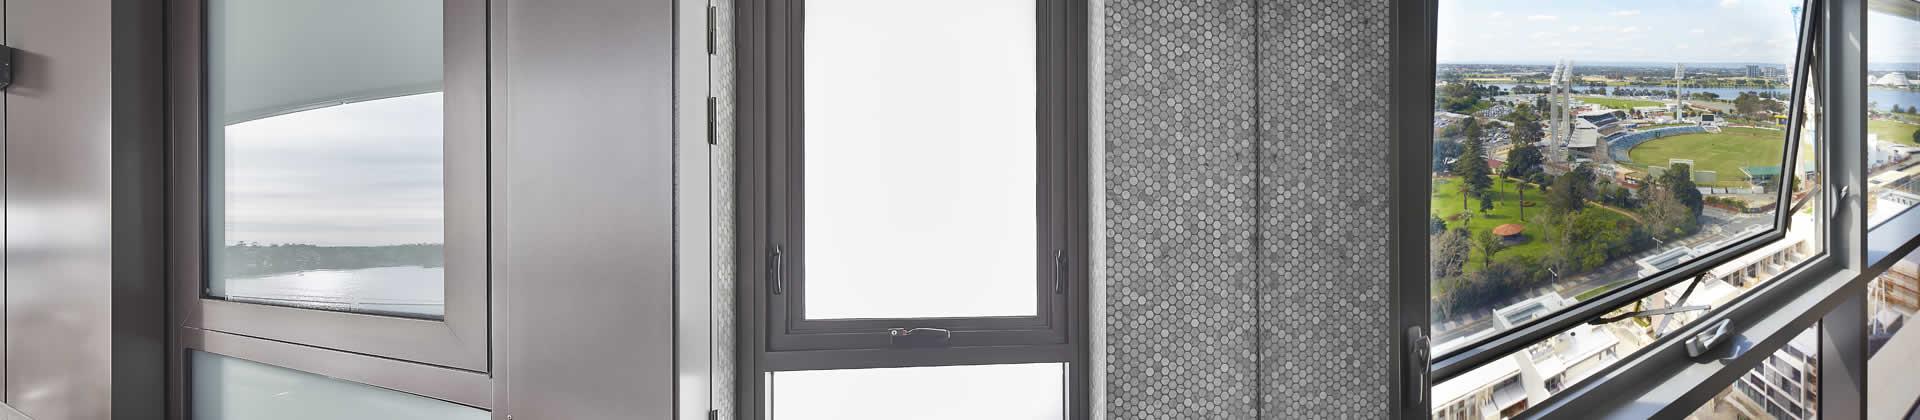 Protlit-Window